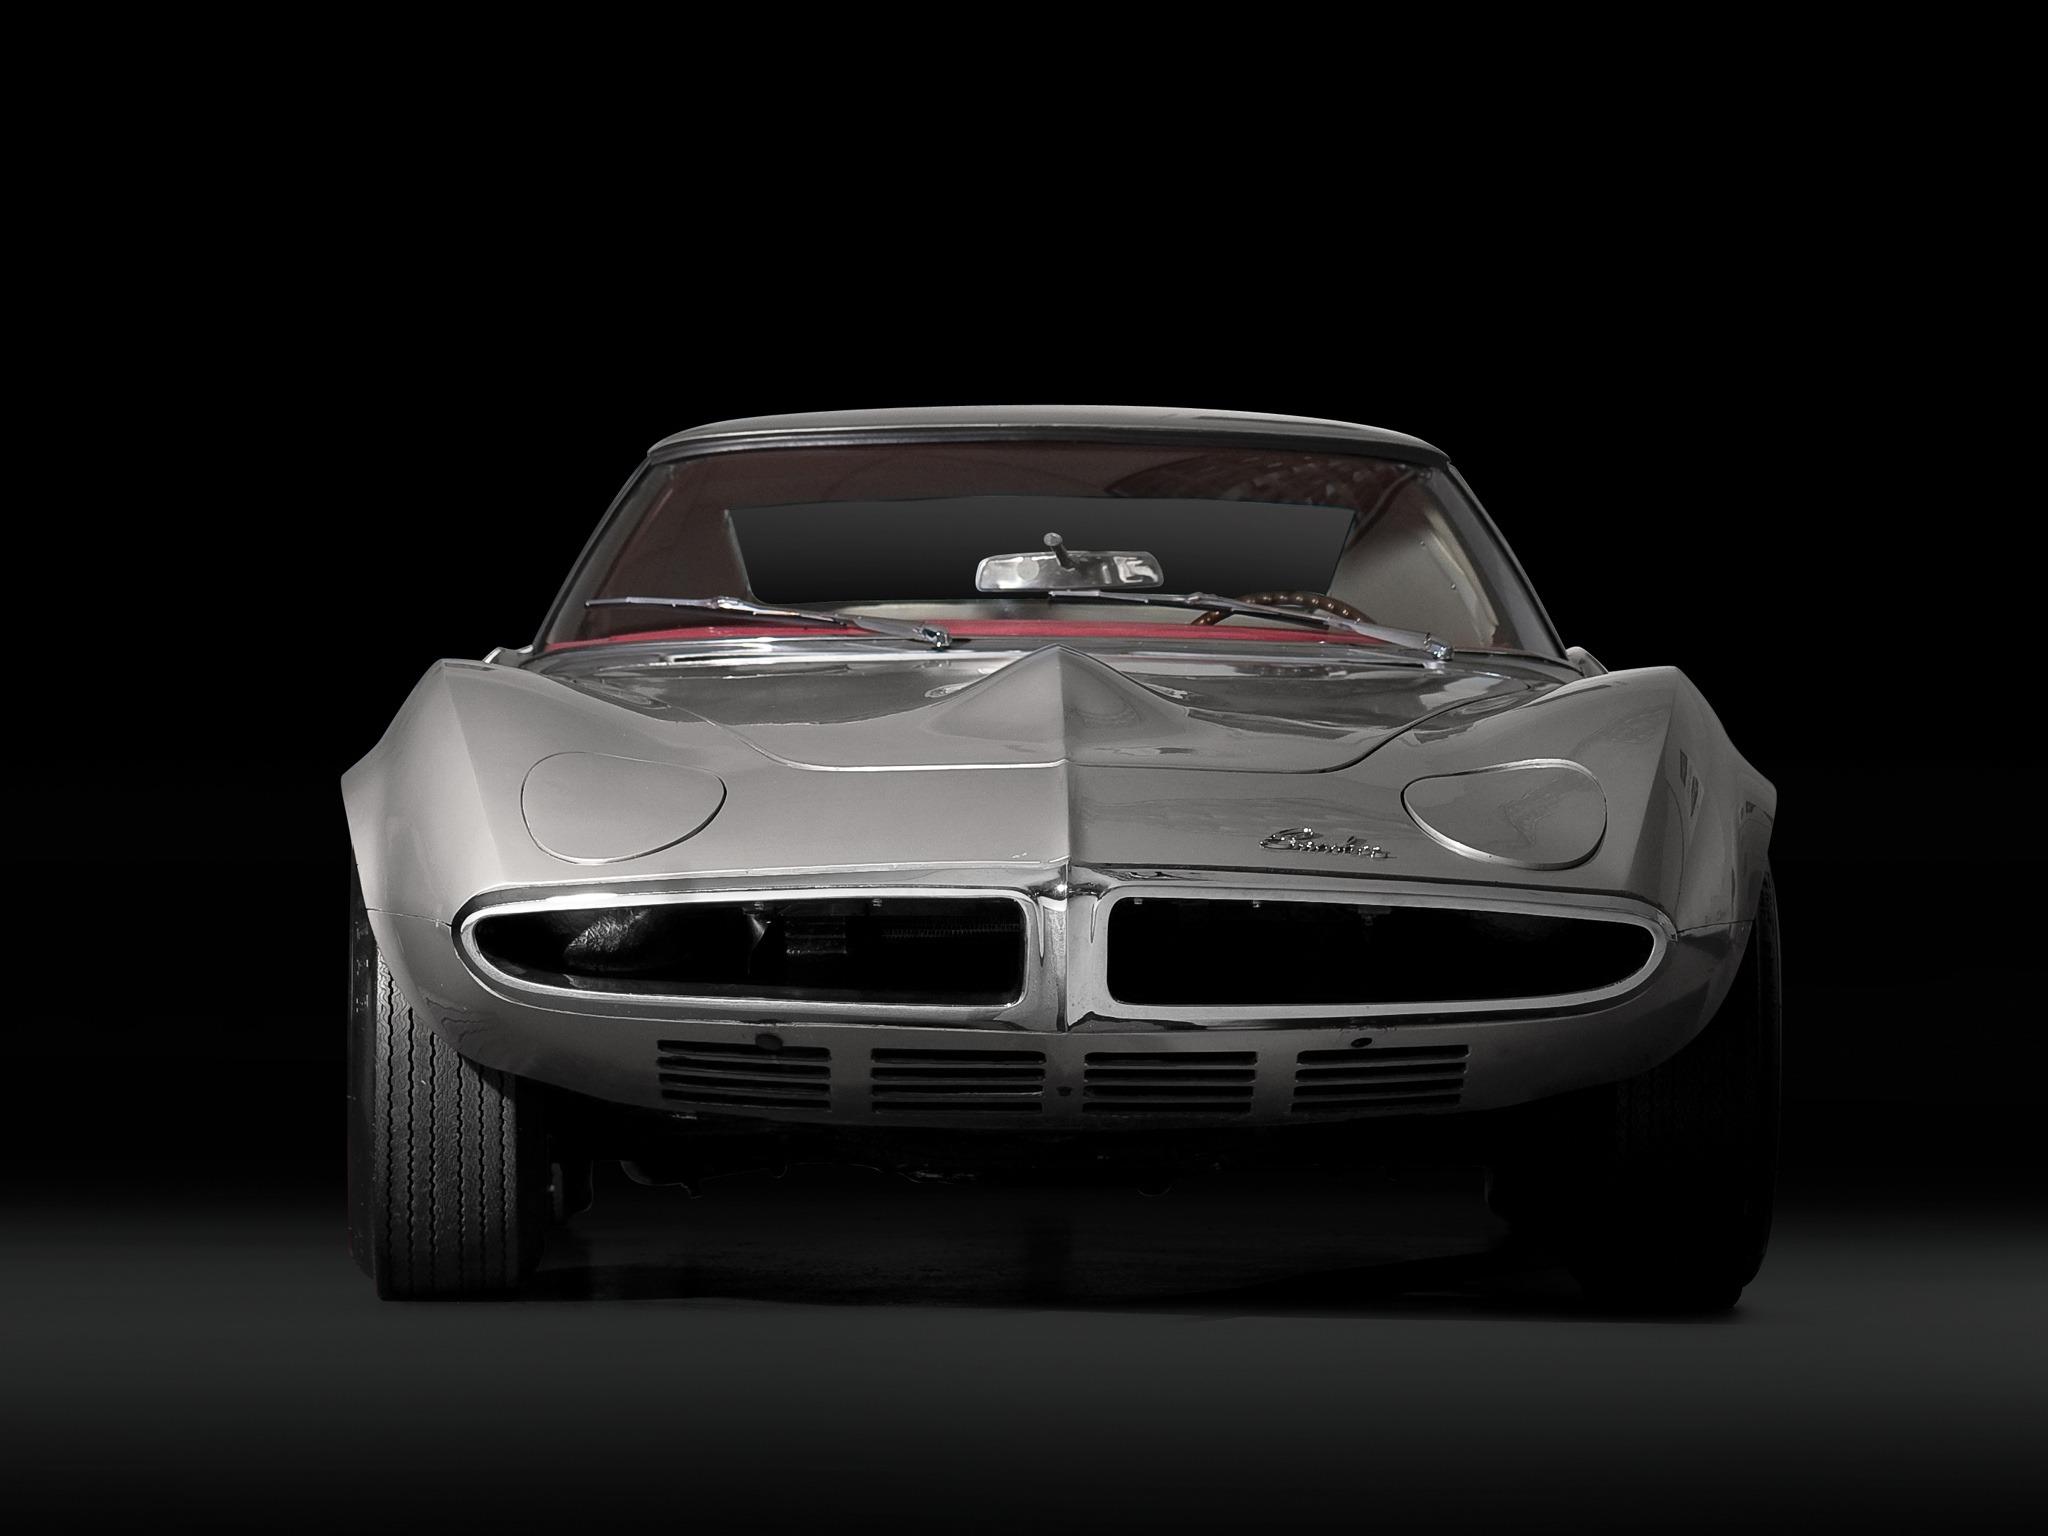 Pontiac Banshee Concept Car 1964 Old Concept Cars